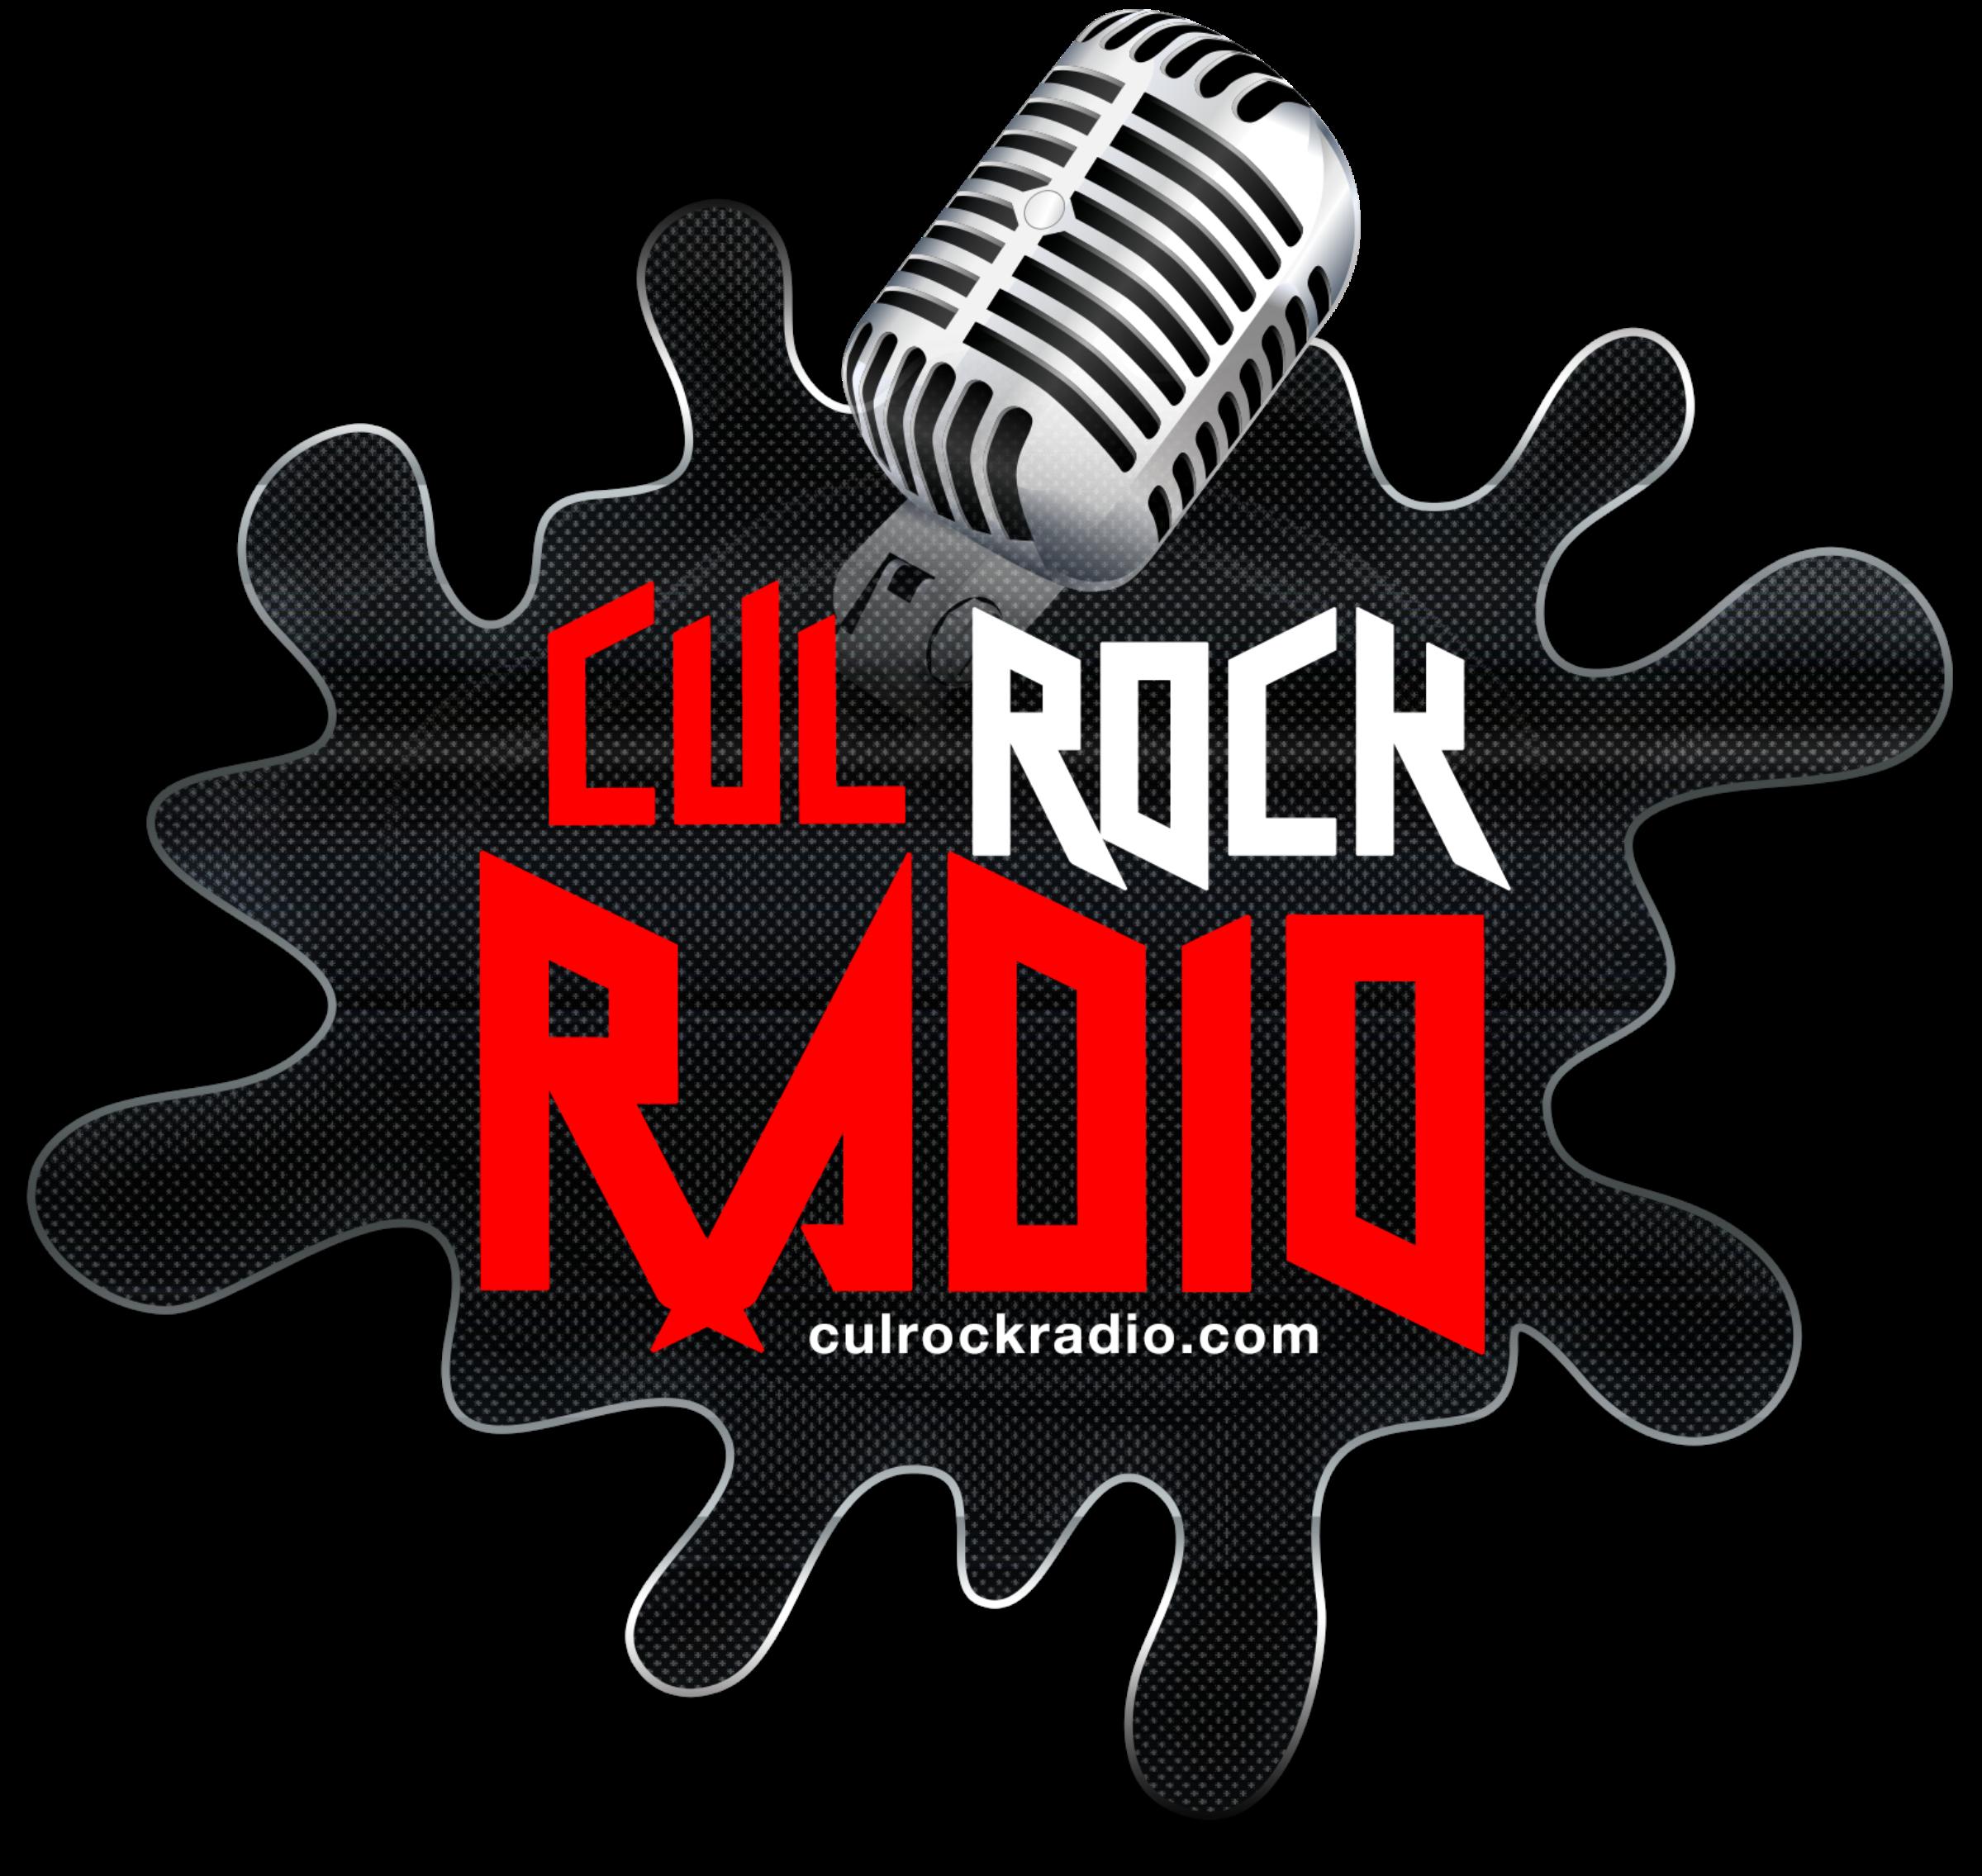 CUL ROCK RADIO